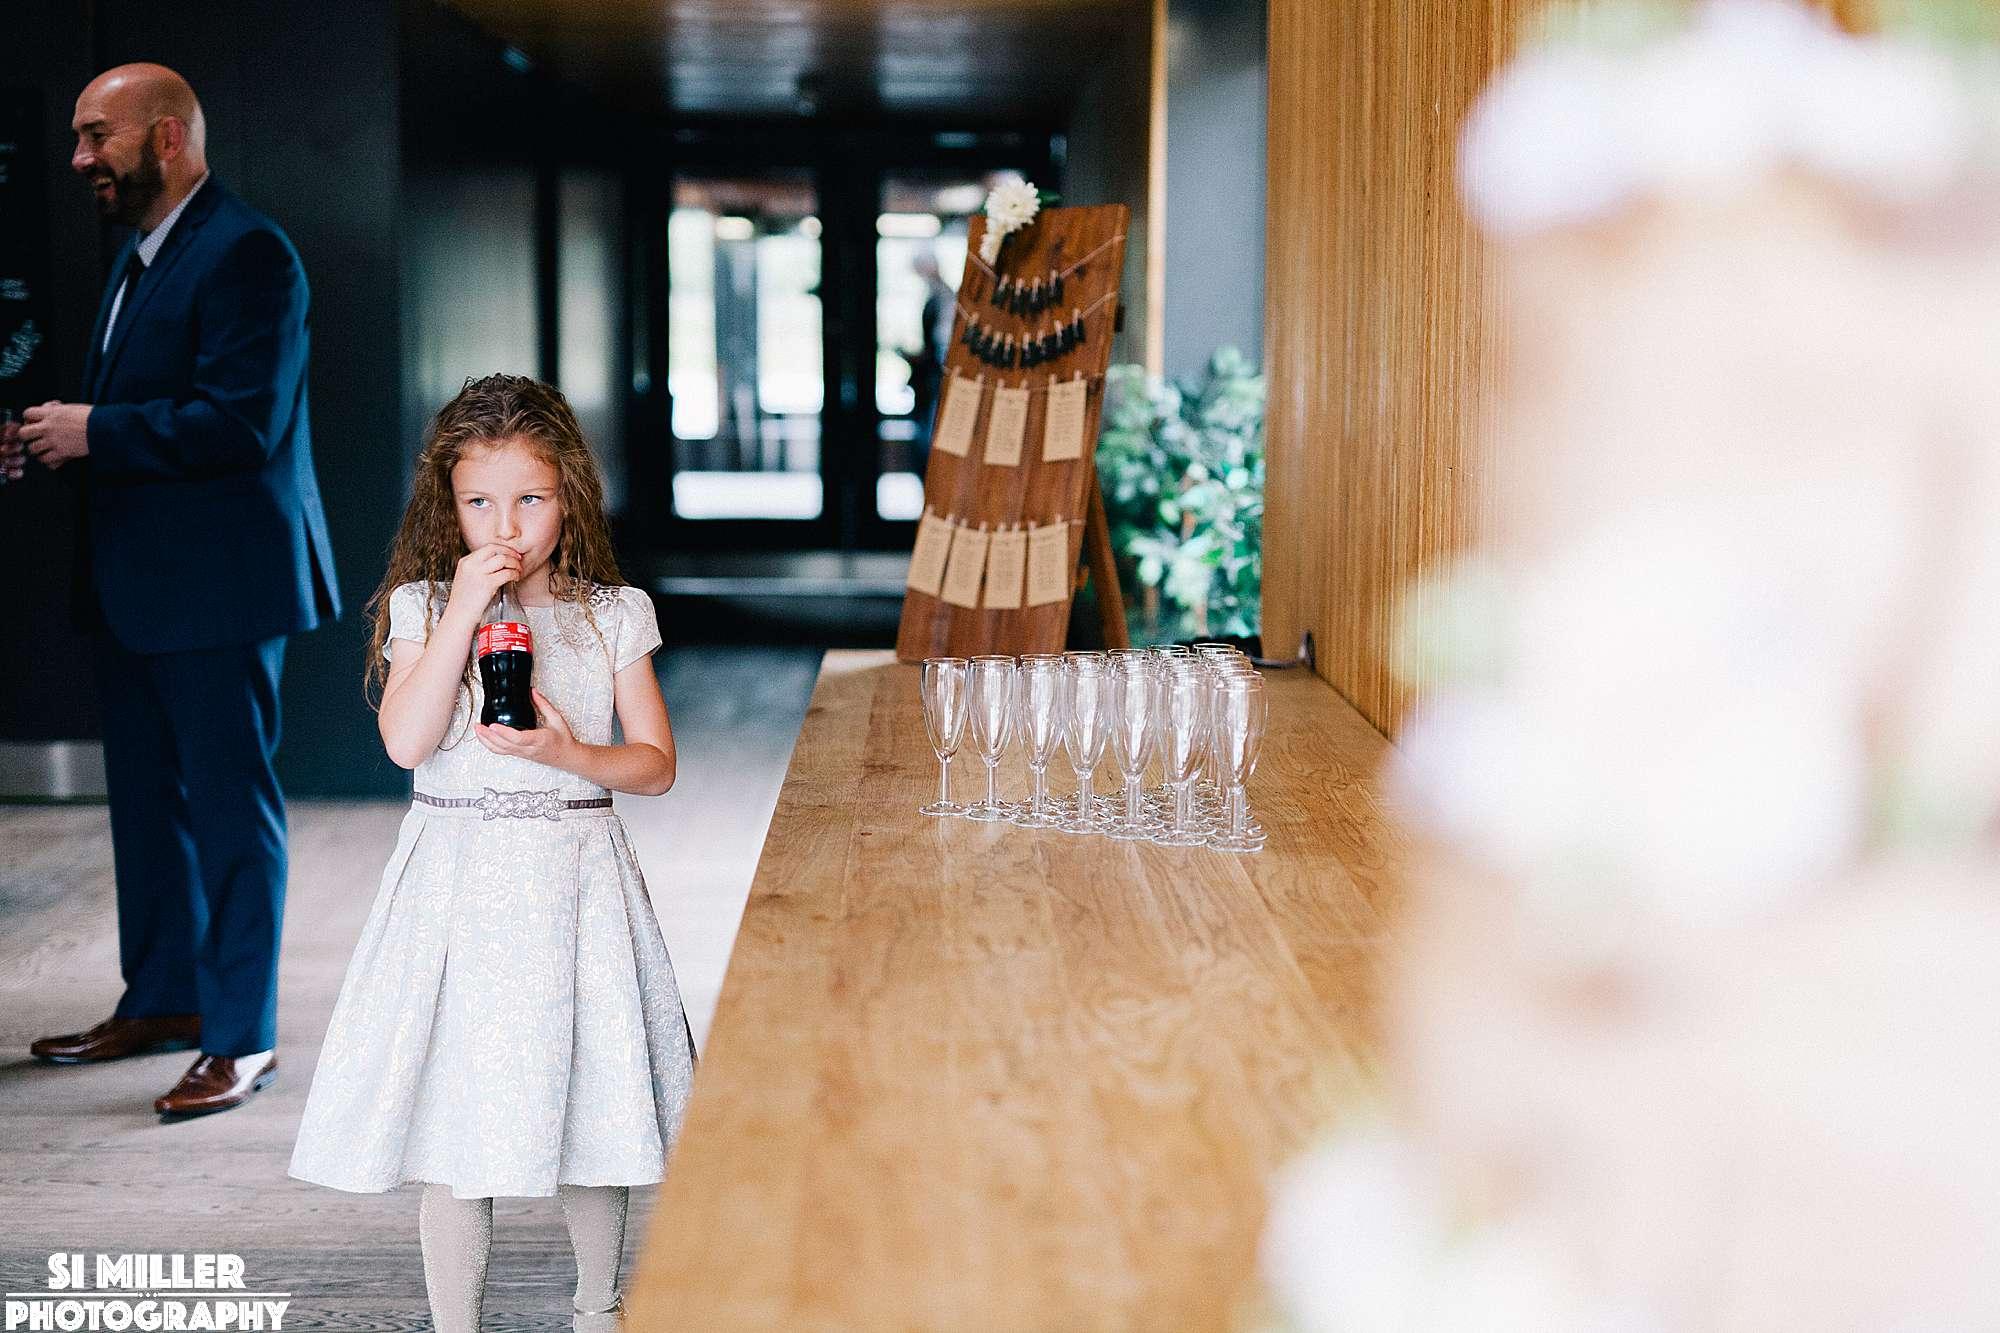 flower girl drinking coca cola bottle at wedding